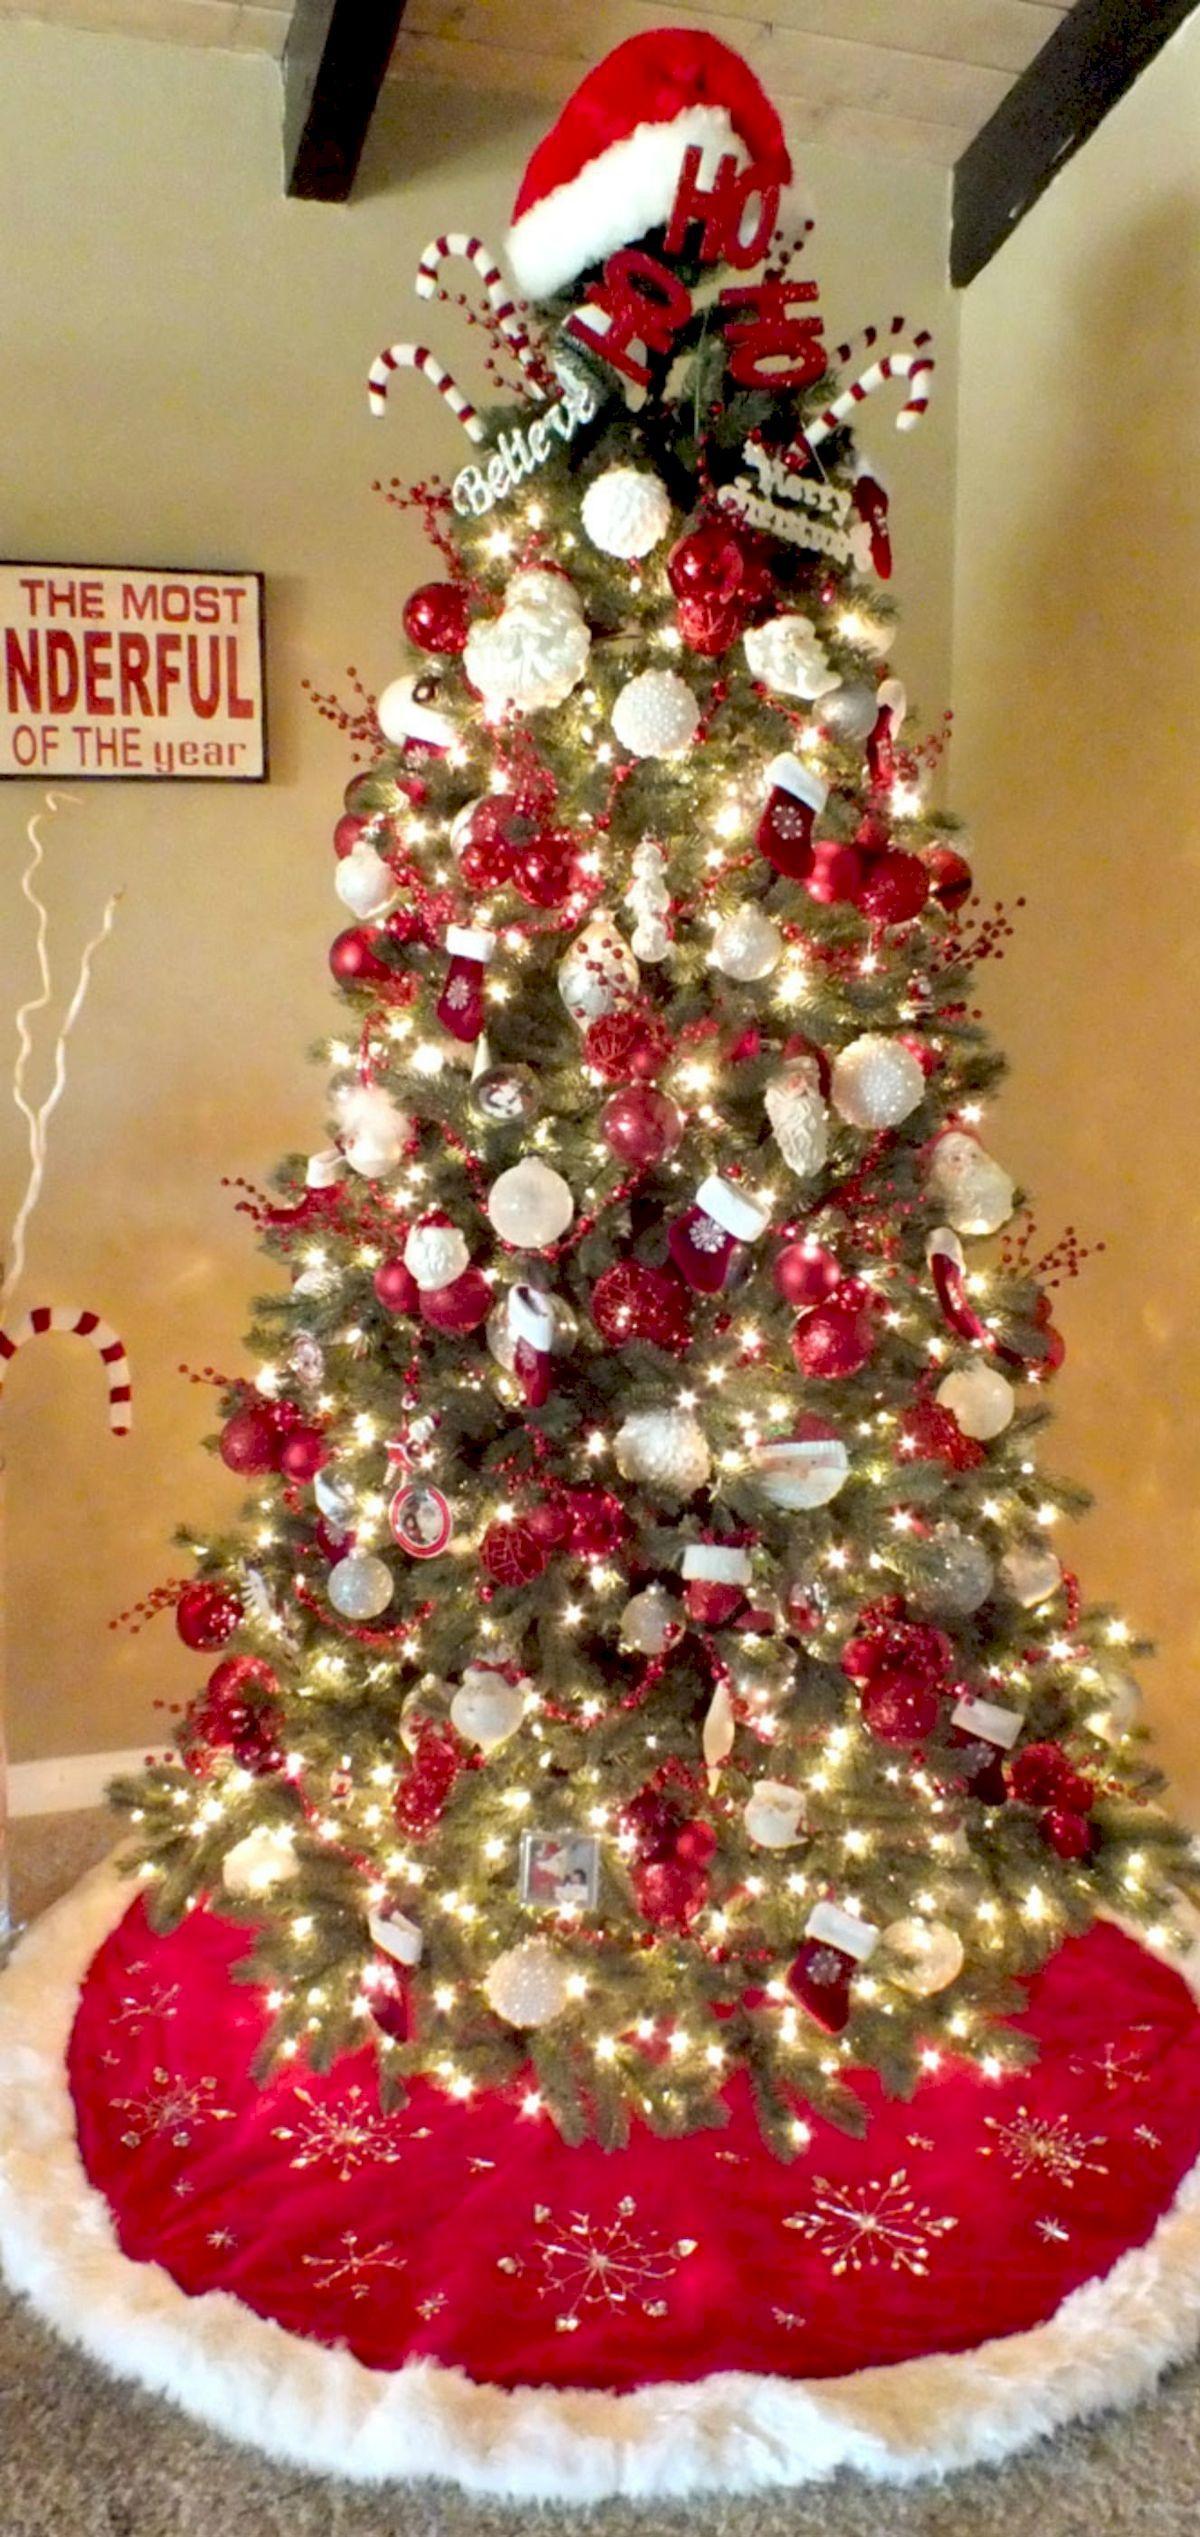 80 Beautiful Christmas Tree Decorating Ideas You Should Try Home Design Christmas Tree Decorations Christmas Tree Themes Christmas Decorations